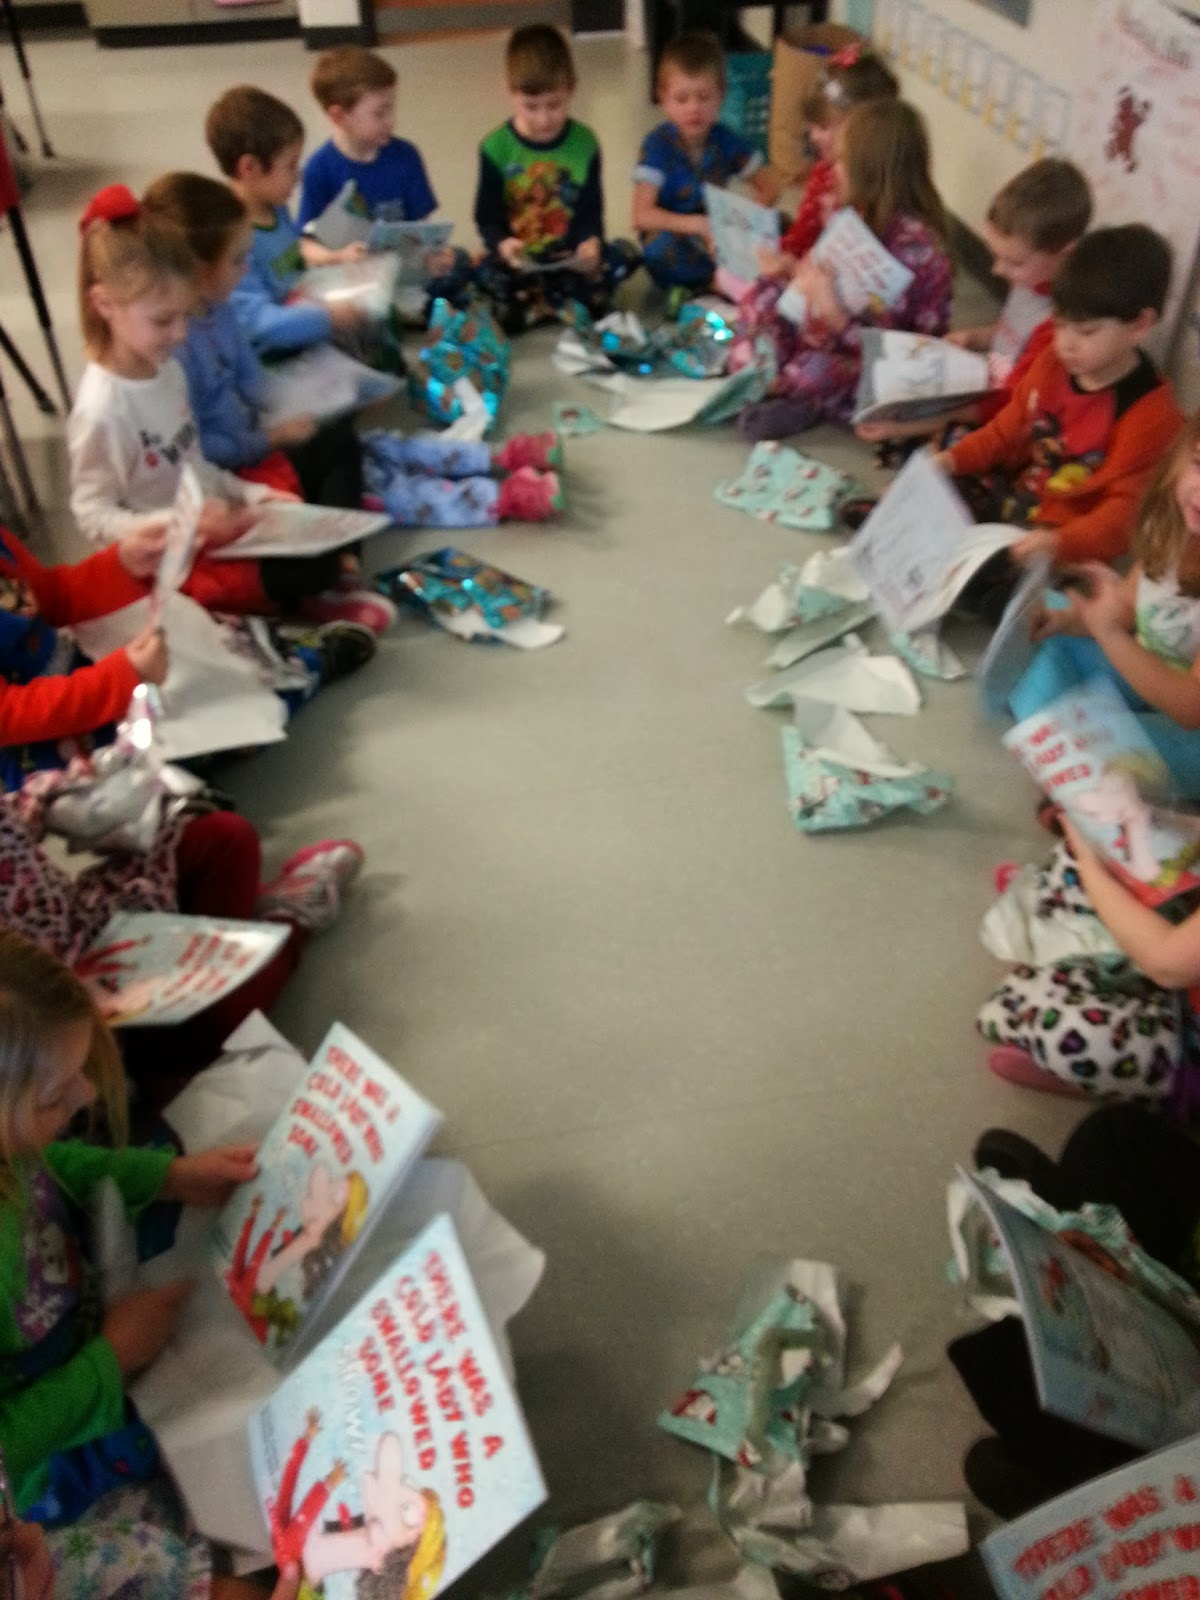 Christmas gift idea for kindergarten class